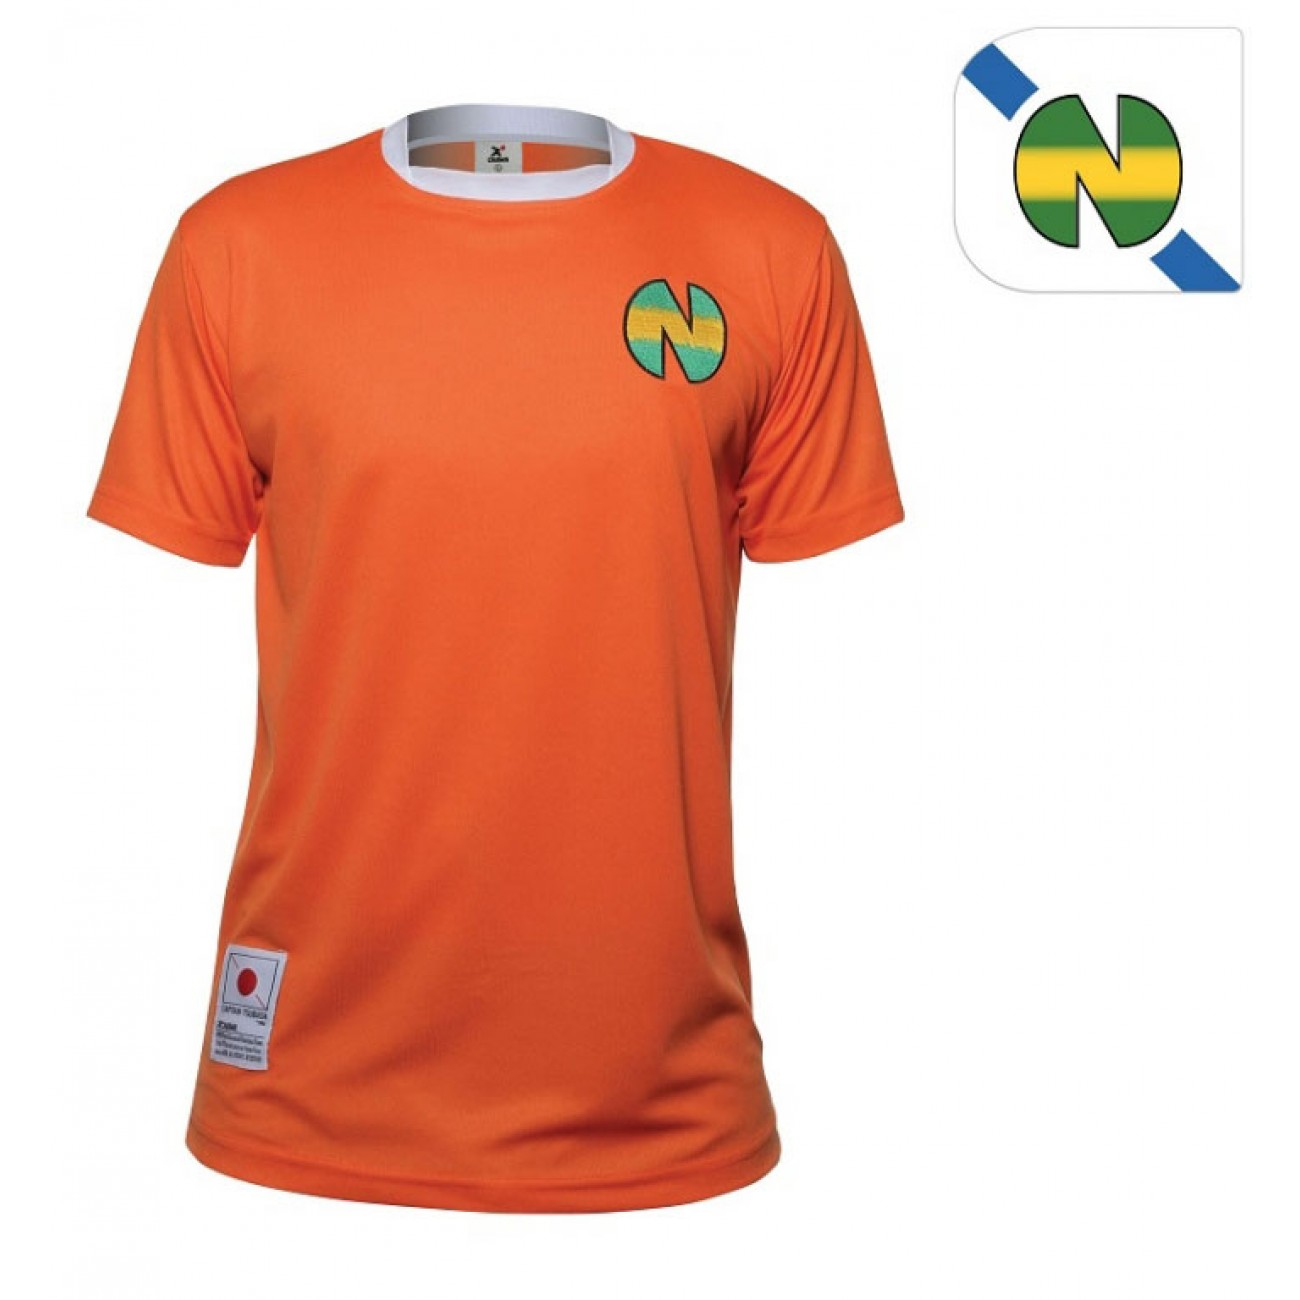 http://www.retrofootball.es/ropa-de-futbol/camiseta-new-team-genzo-wakabayashi.html